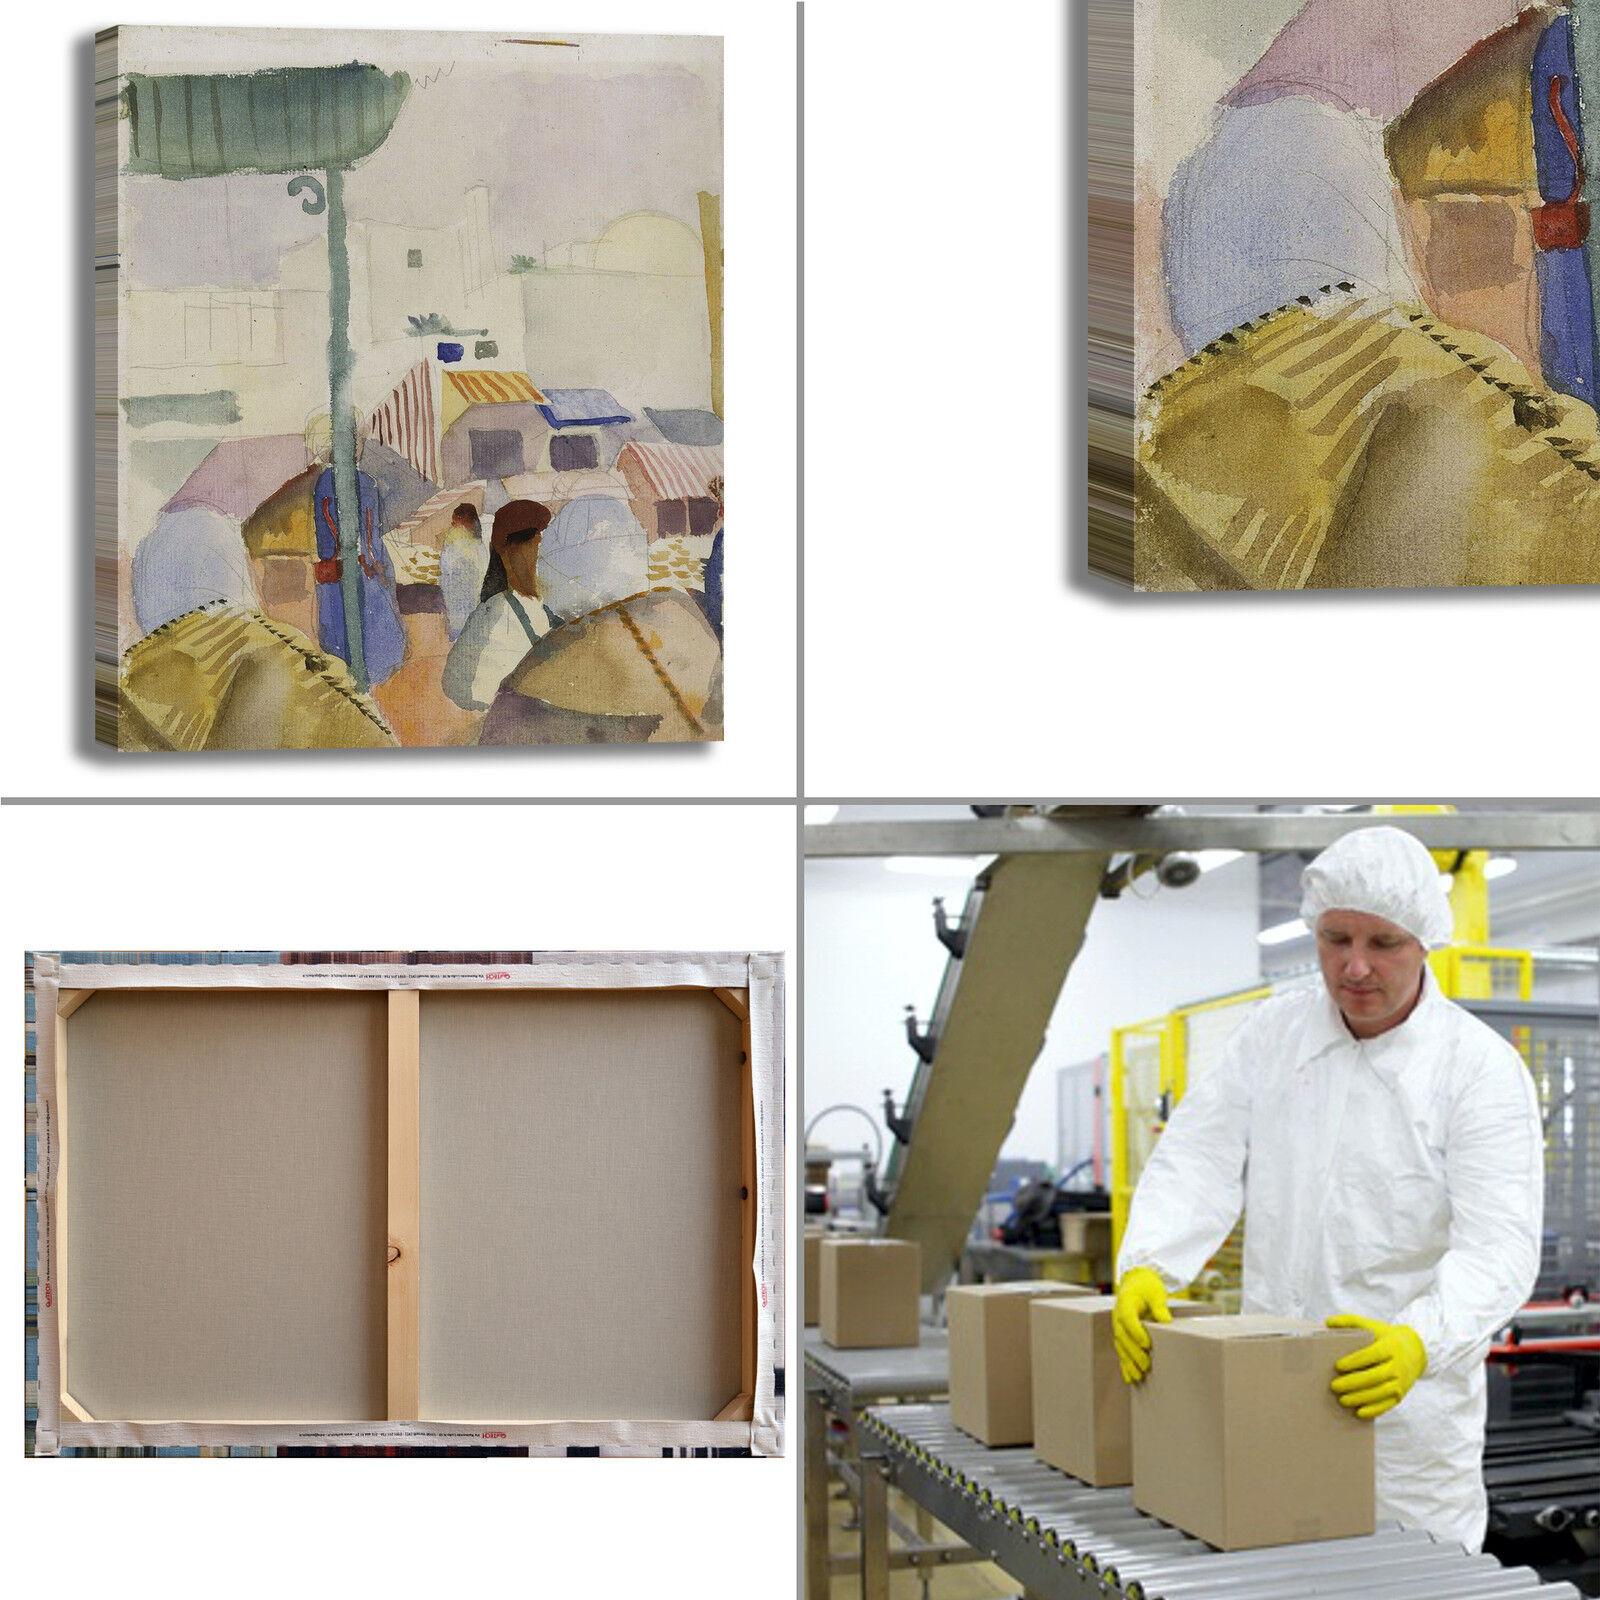 Macke mercato a tunisi 2 design stampa quadro stampa design tela dipinto telaio arRouge o casa b21666